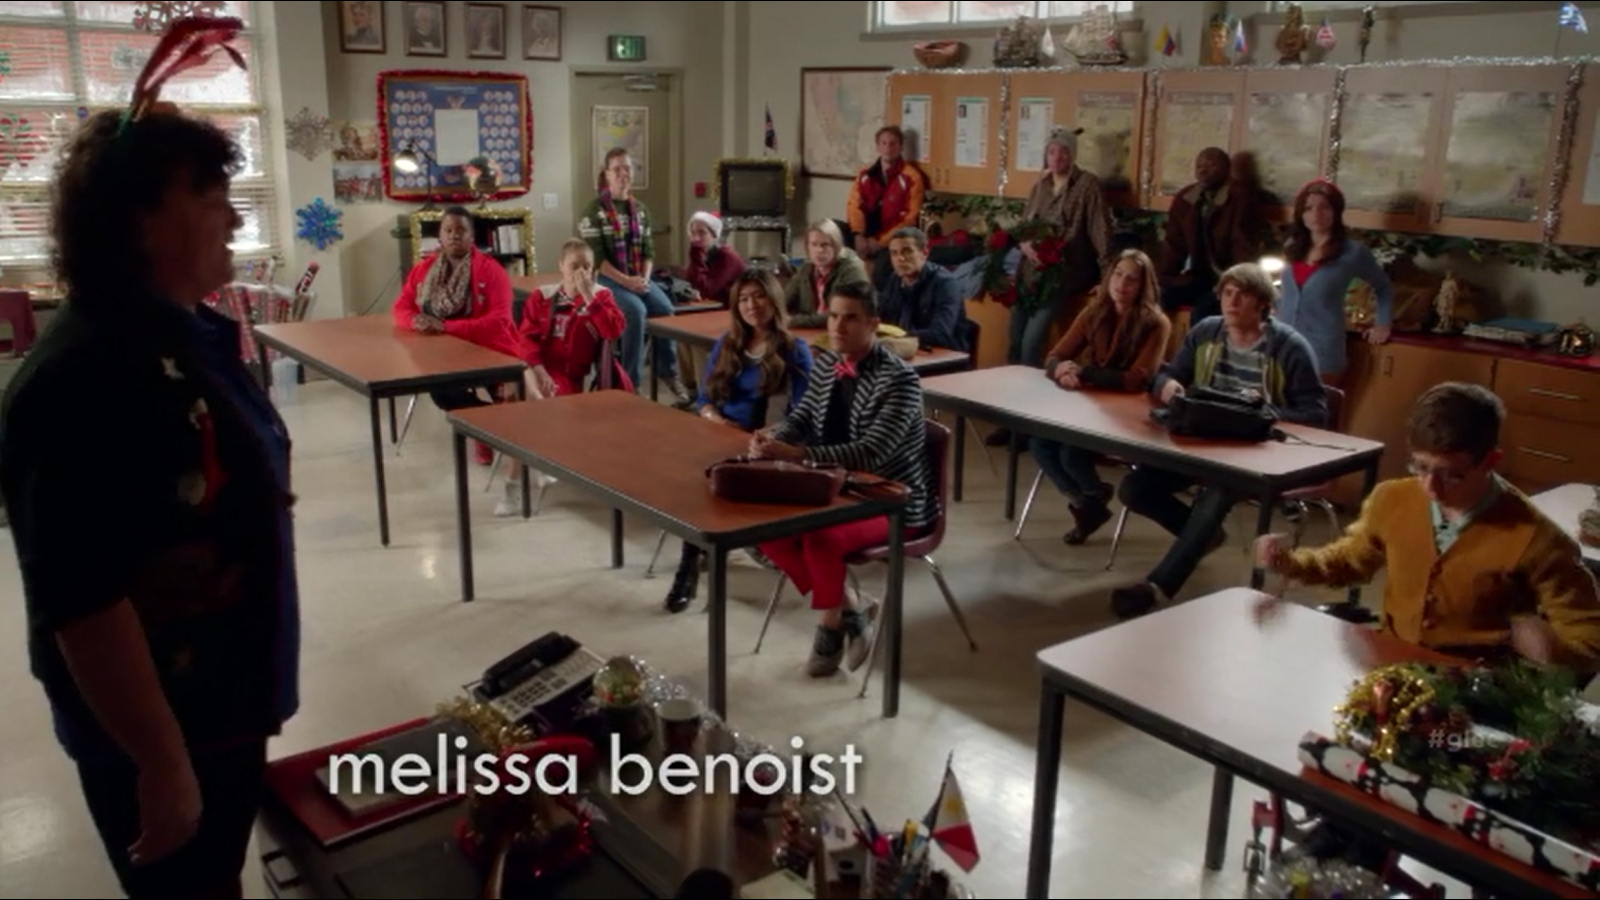 McKinley High Non-Denominational Christmas Club | Glee TV